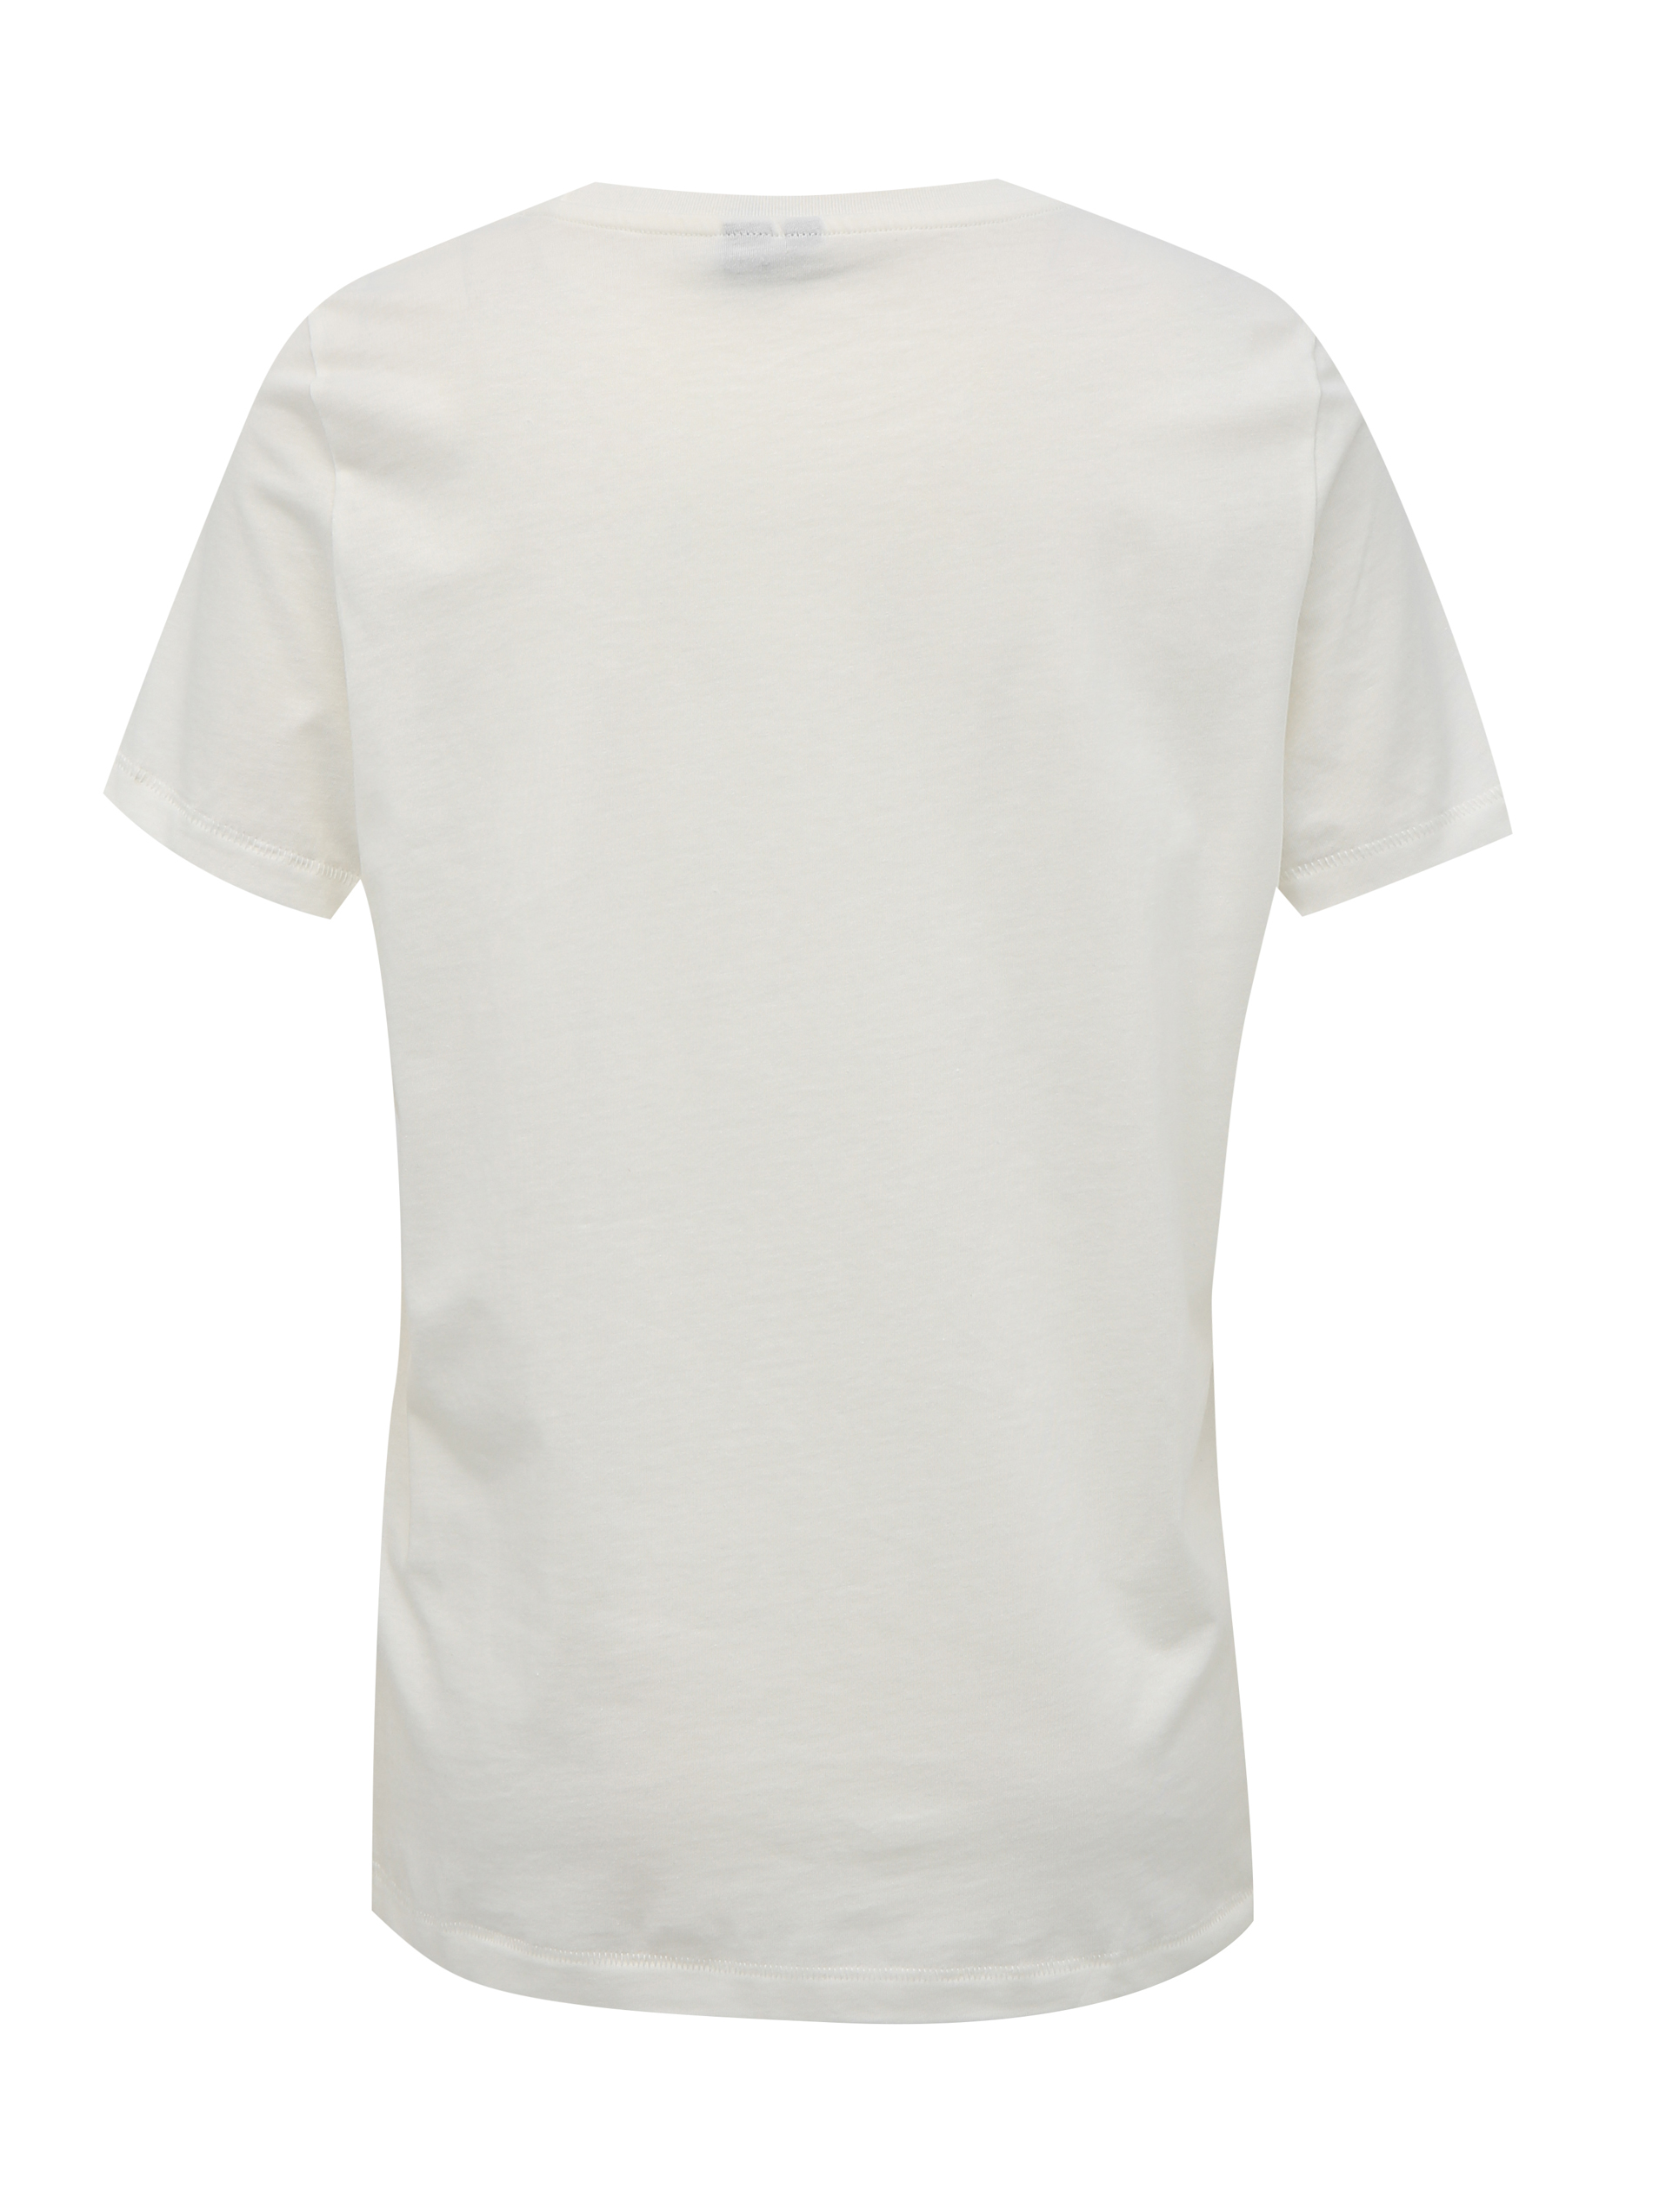 Vero Moda bela majica Desert s tiskom